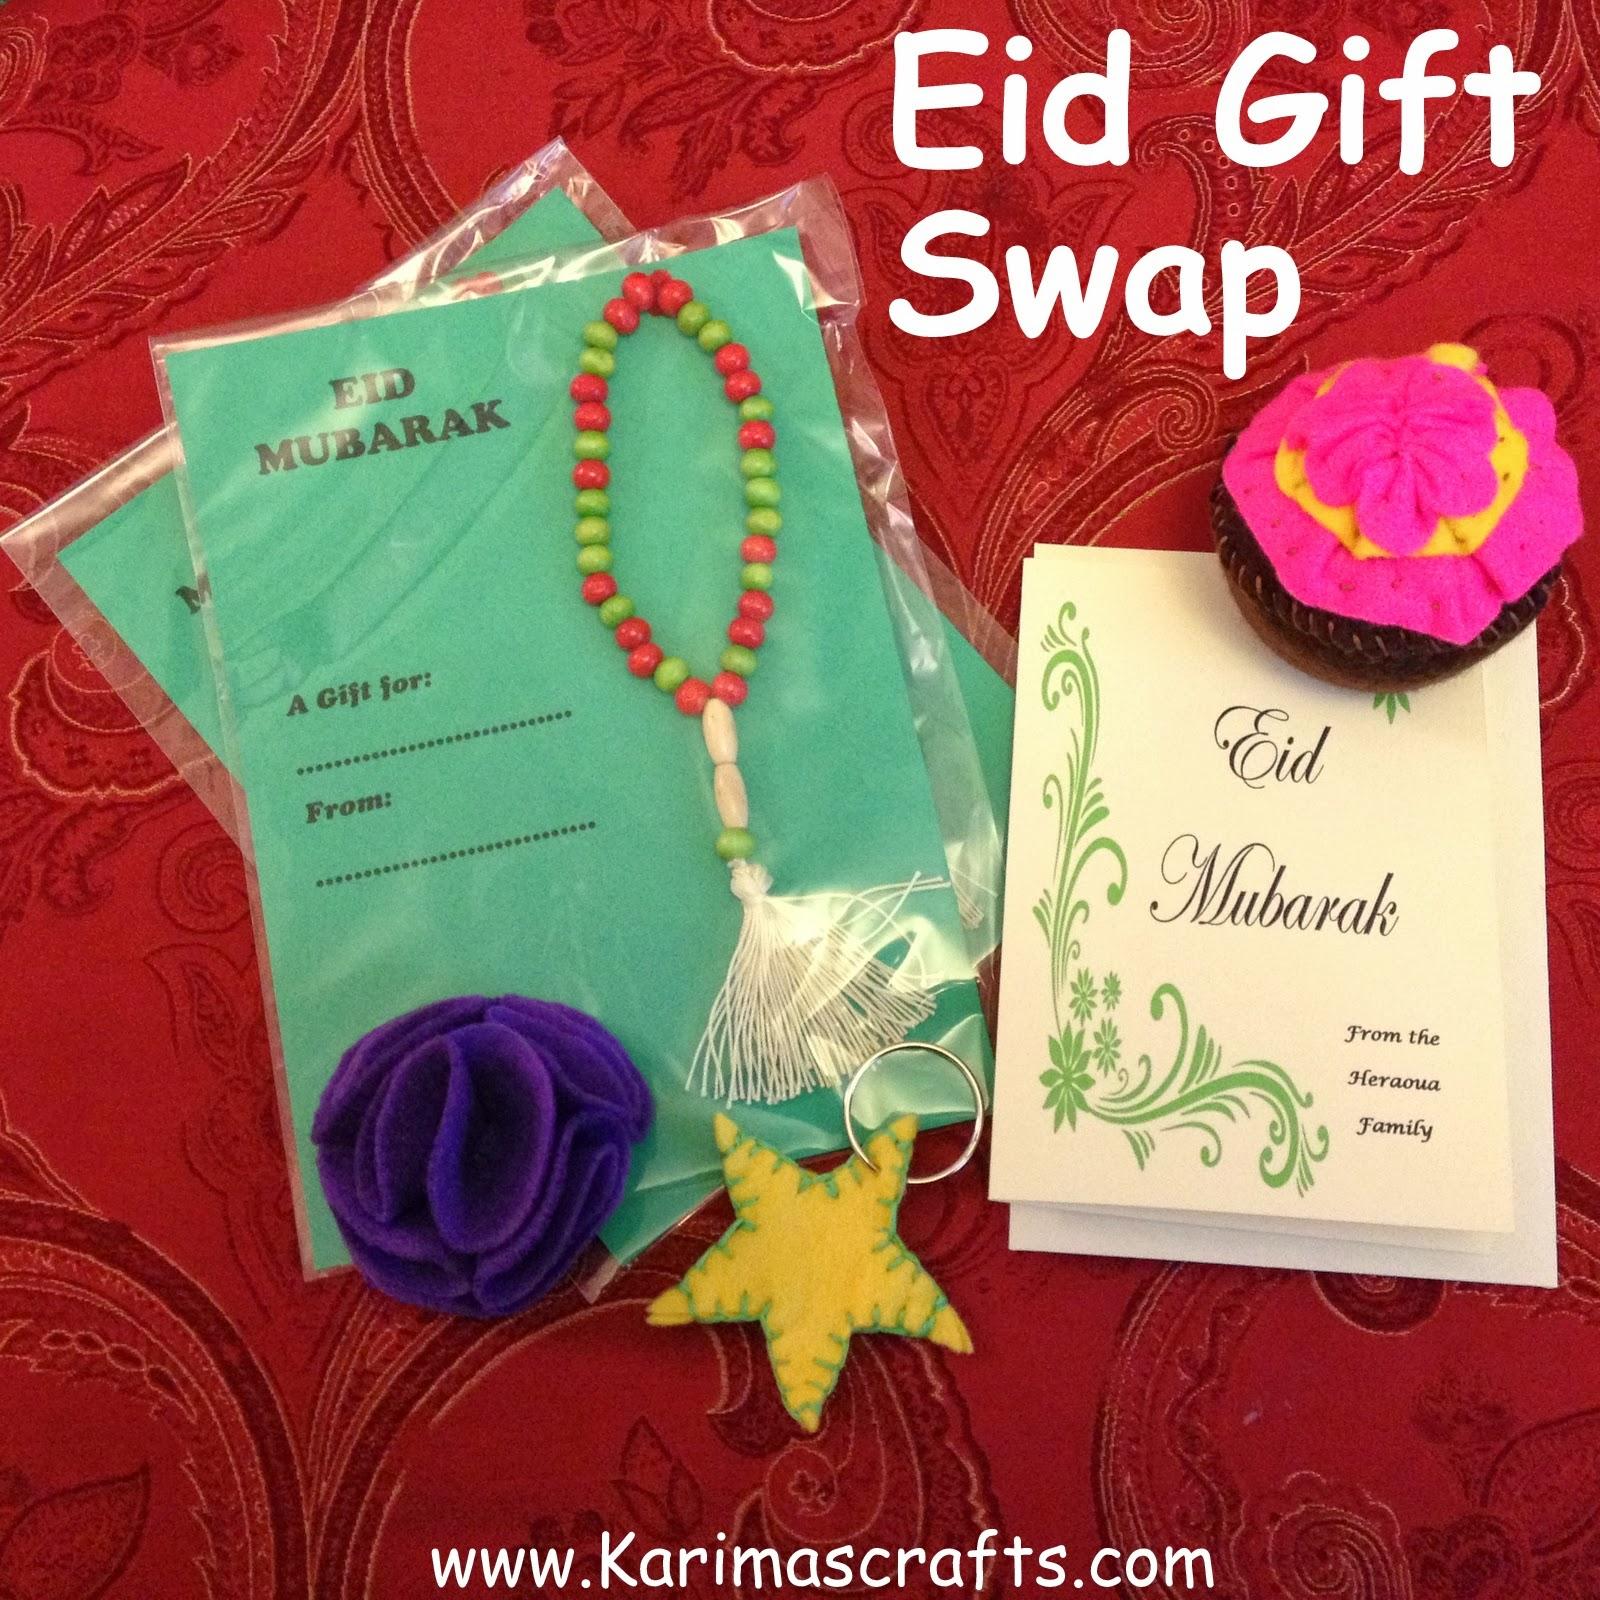 Karimas crafts eid gift swap 2013 eid gift swap 2013 negle Choice Image